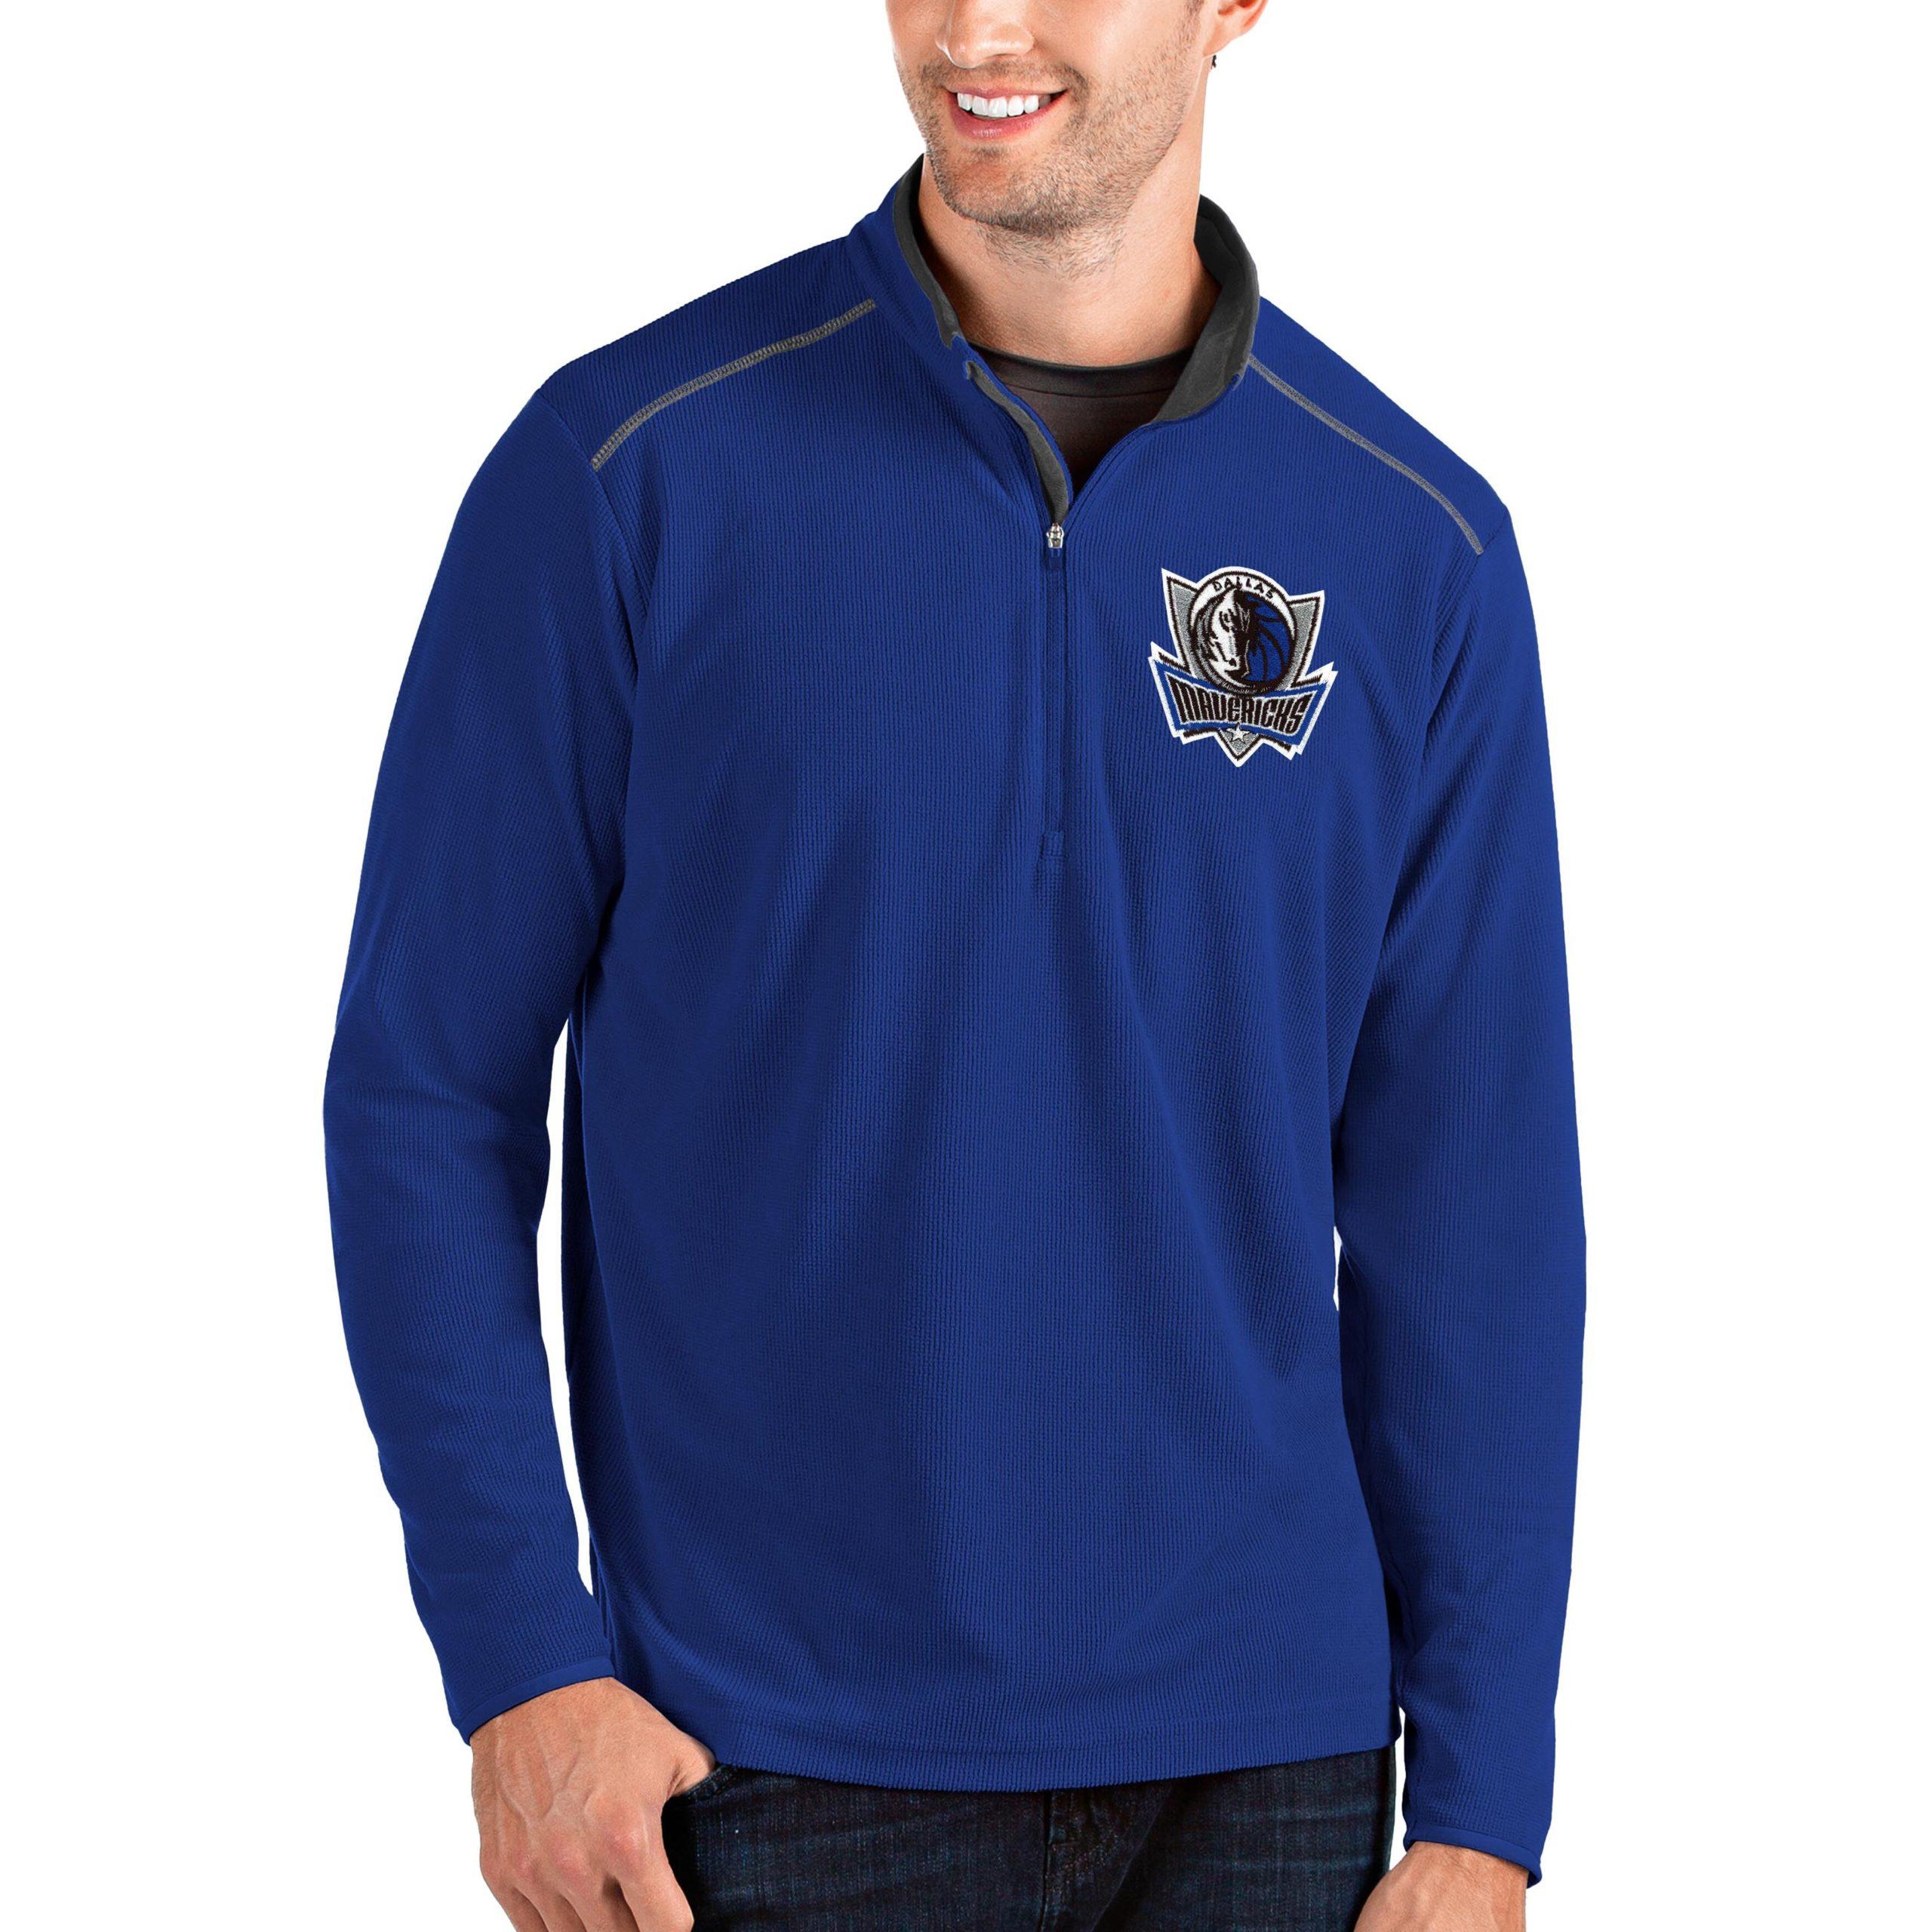 Dallas Mavericks Antigua Big & Tall Glacier Quarter-Zip Pullover Jacket - Royal/Gray